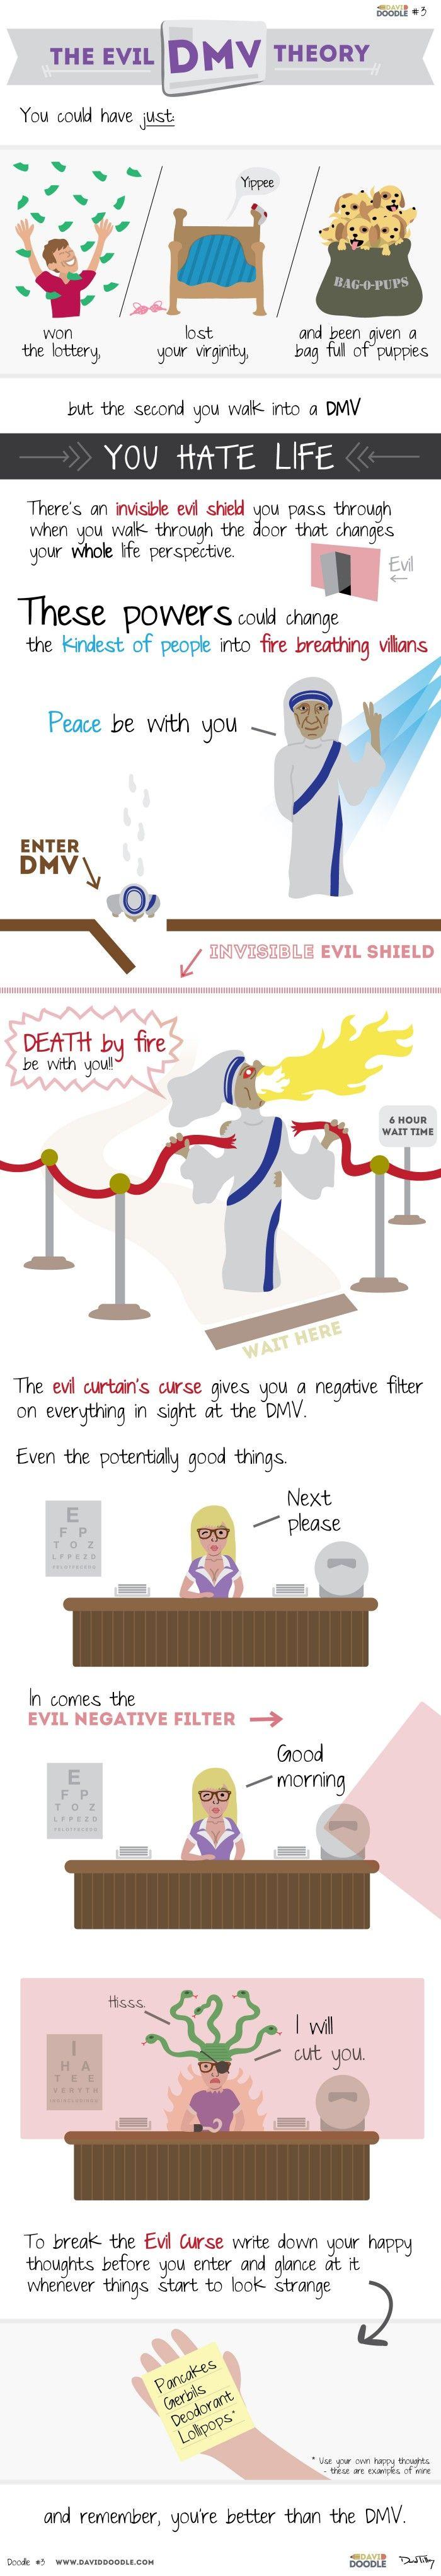 8 best funny dmv images on pinterest dmv humor funny stuff and